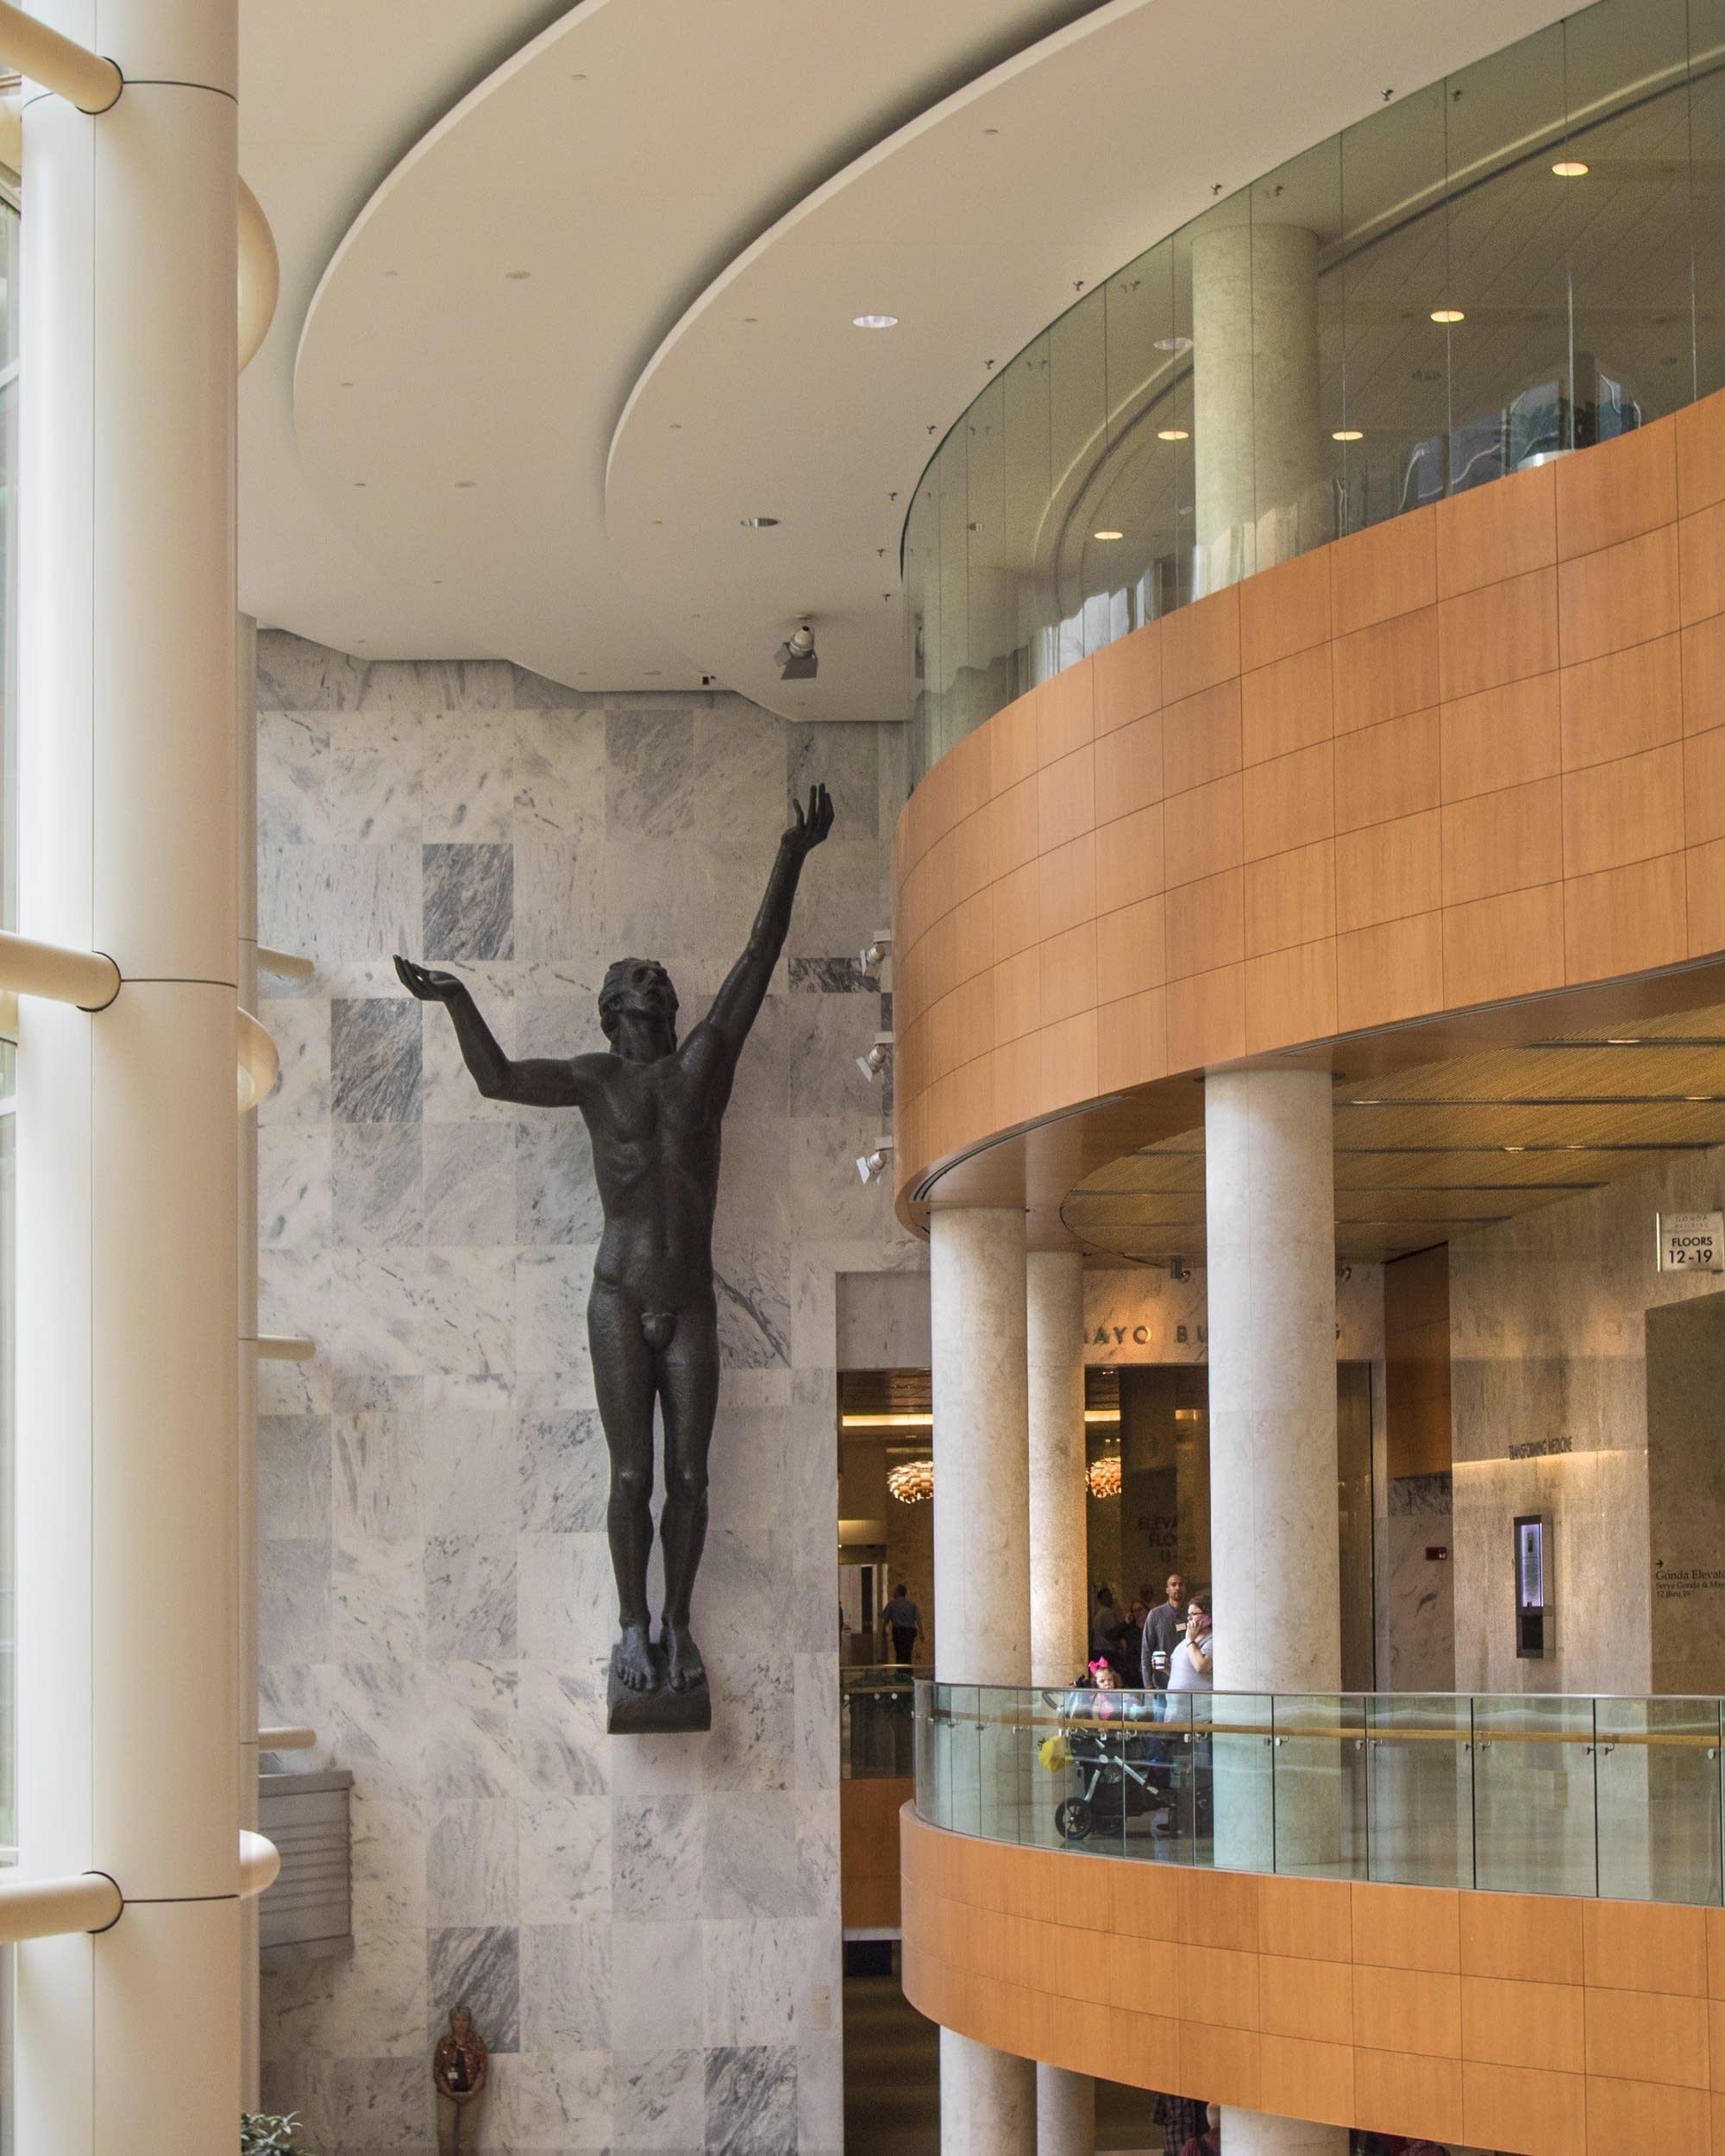 Photos: A walk through Mayo Clinic's healing art | MPR News